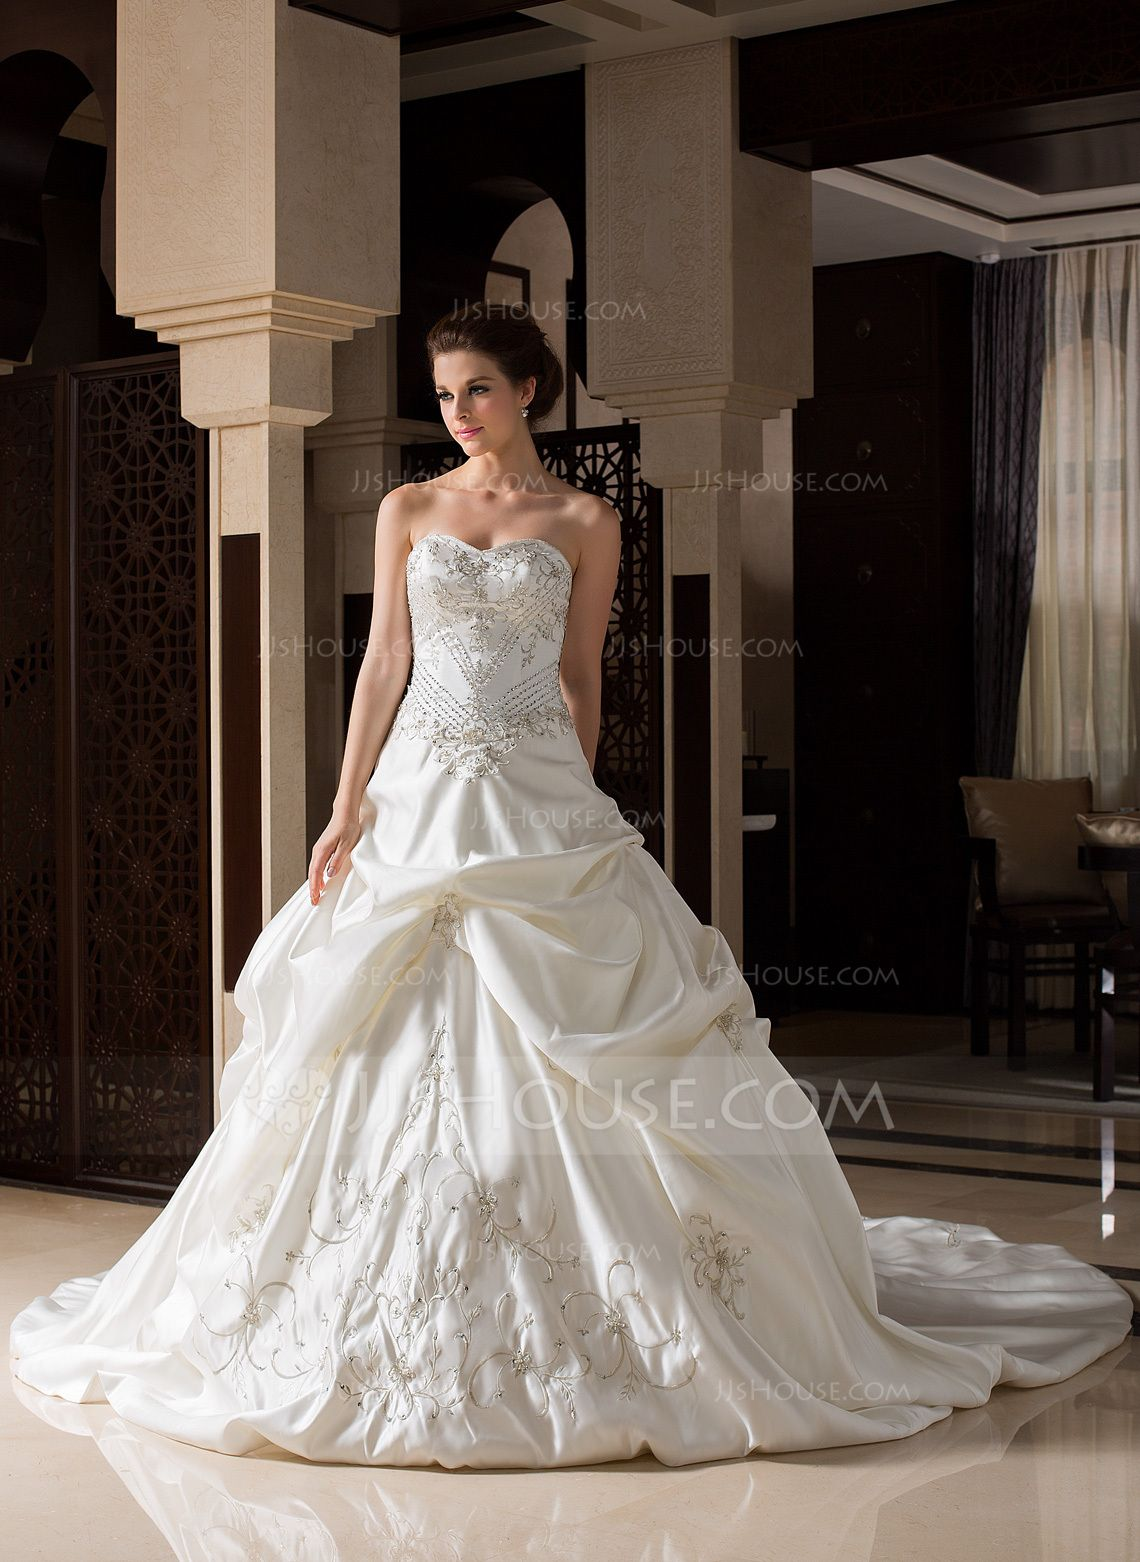 Corte de baile Escote corazón Tren de la catedral Satén Vestido de novia con Bordado Volantes Bordado (002033765) - JJsHouse